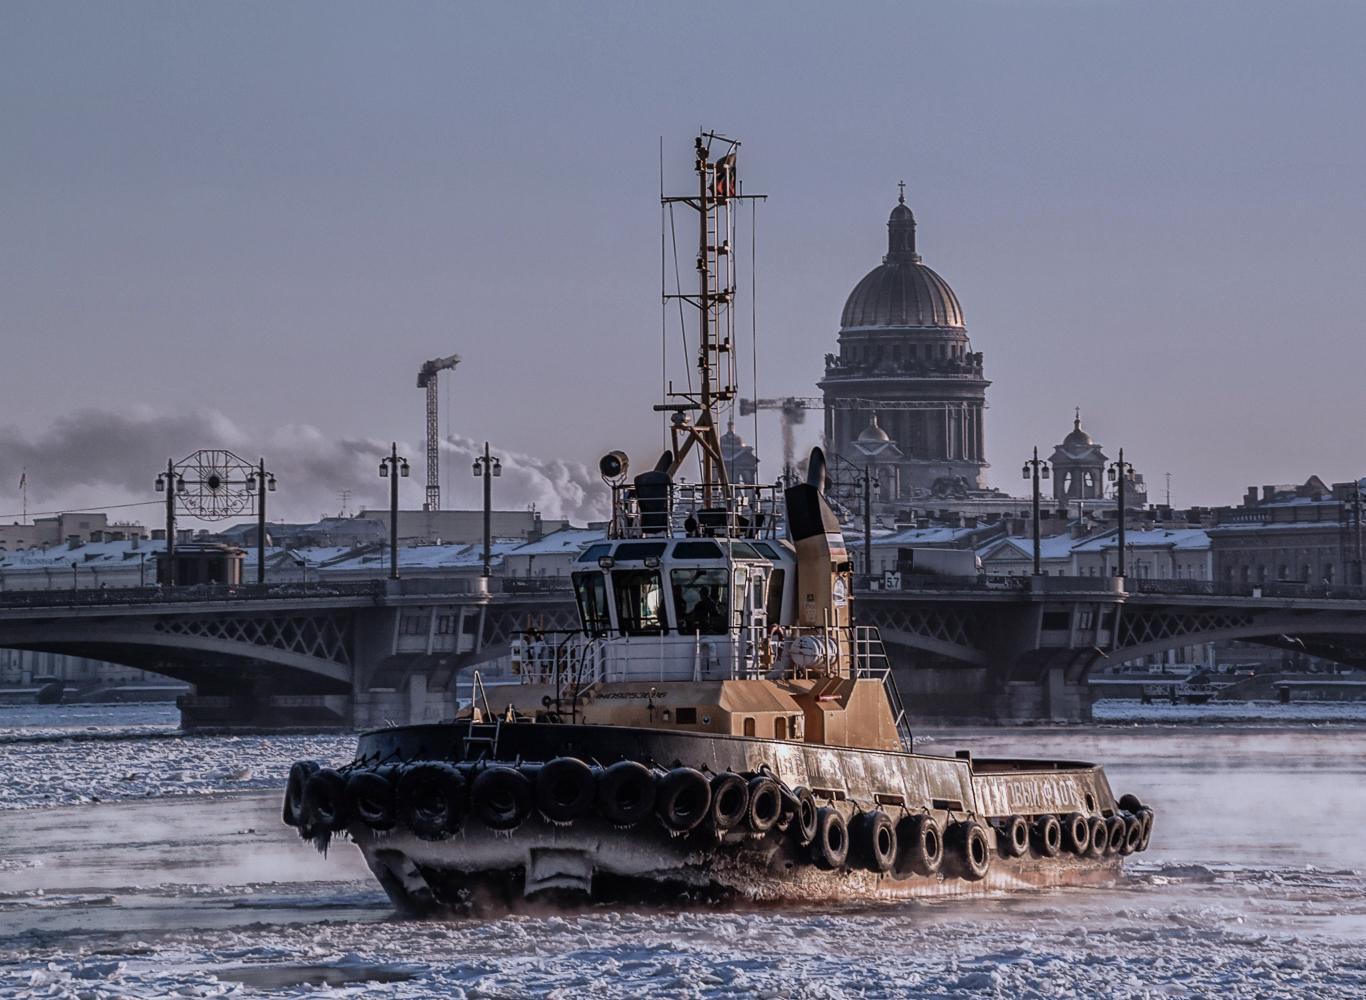 On the Neva river